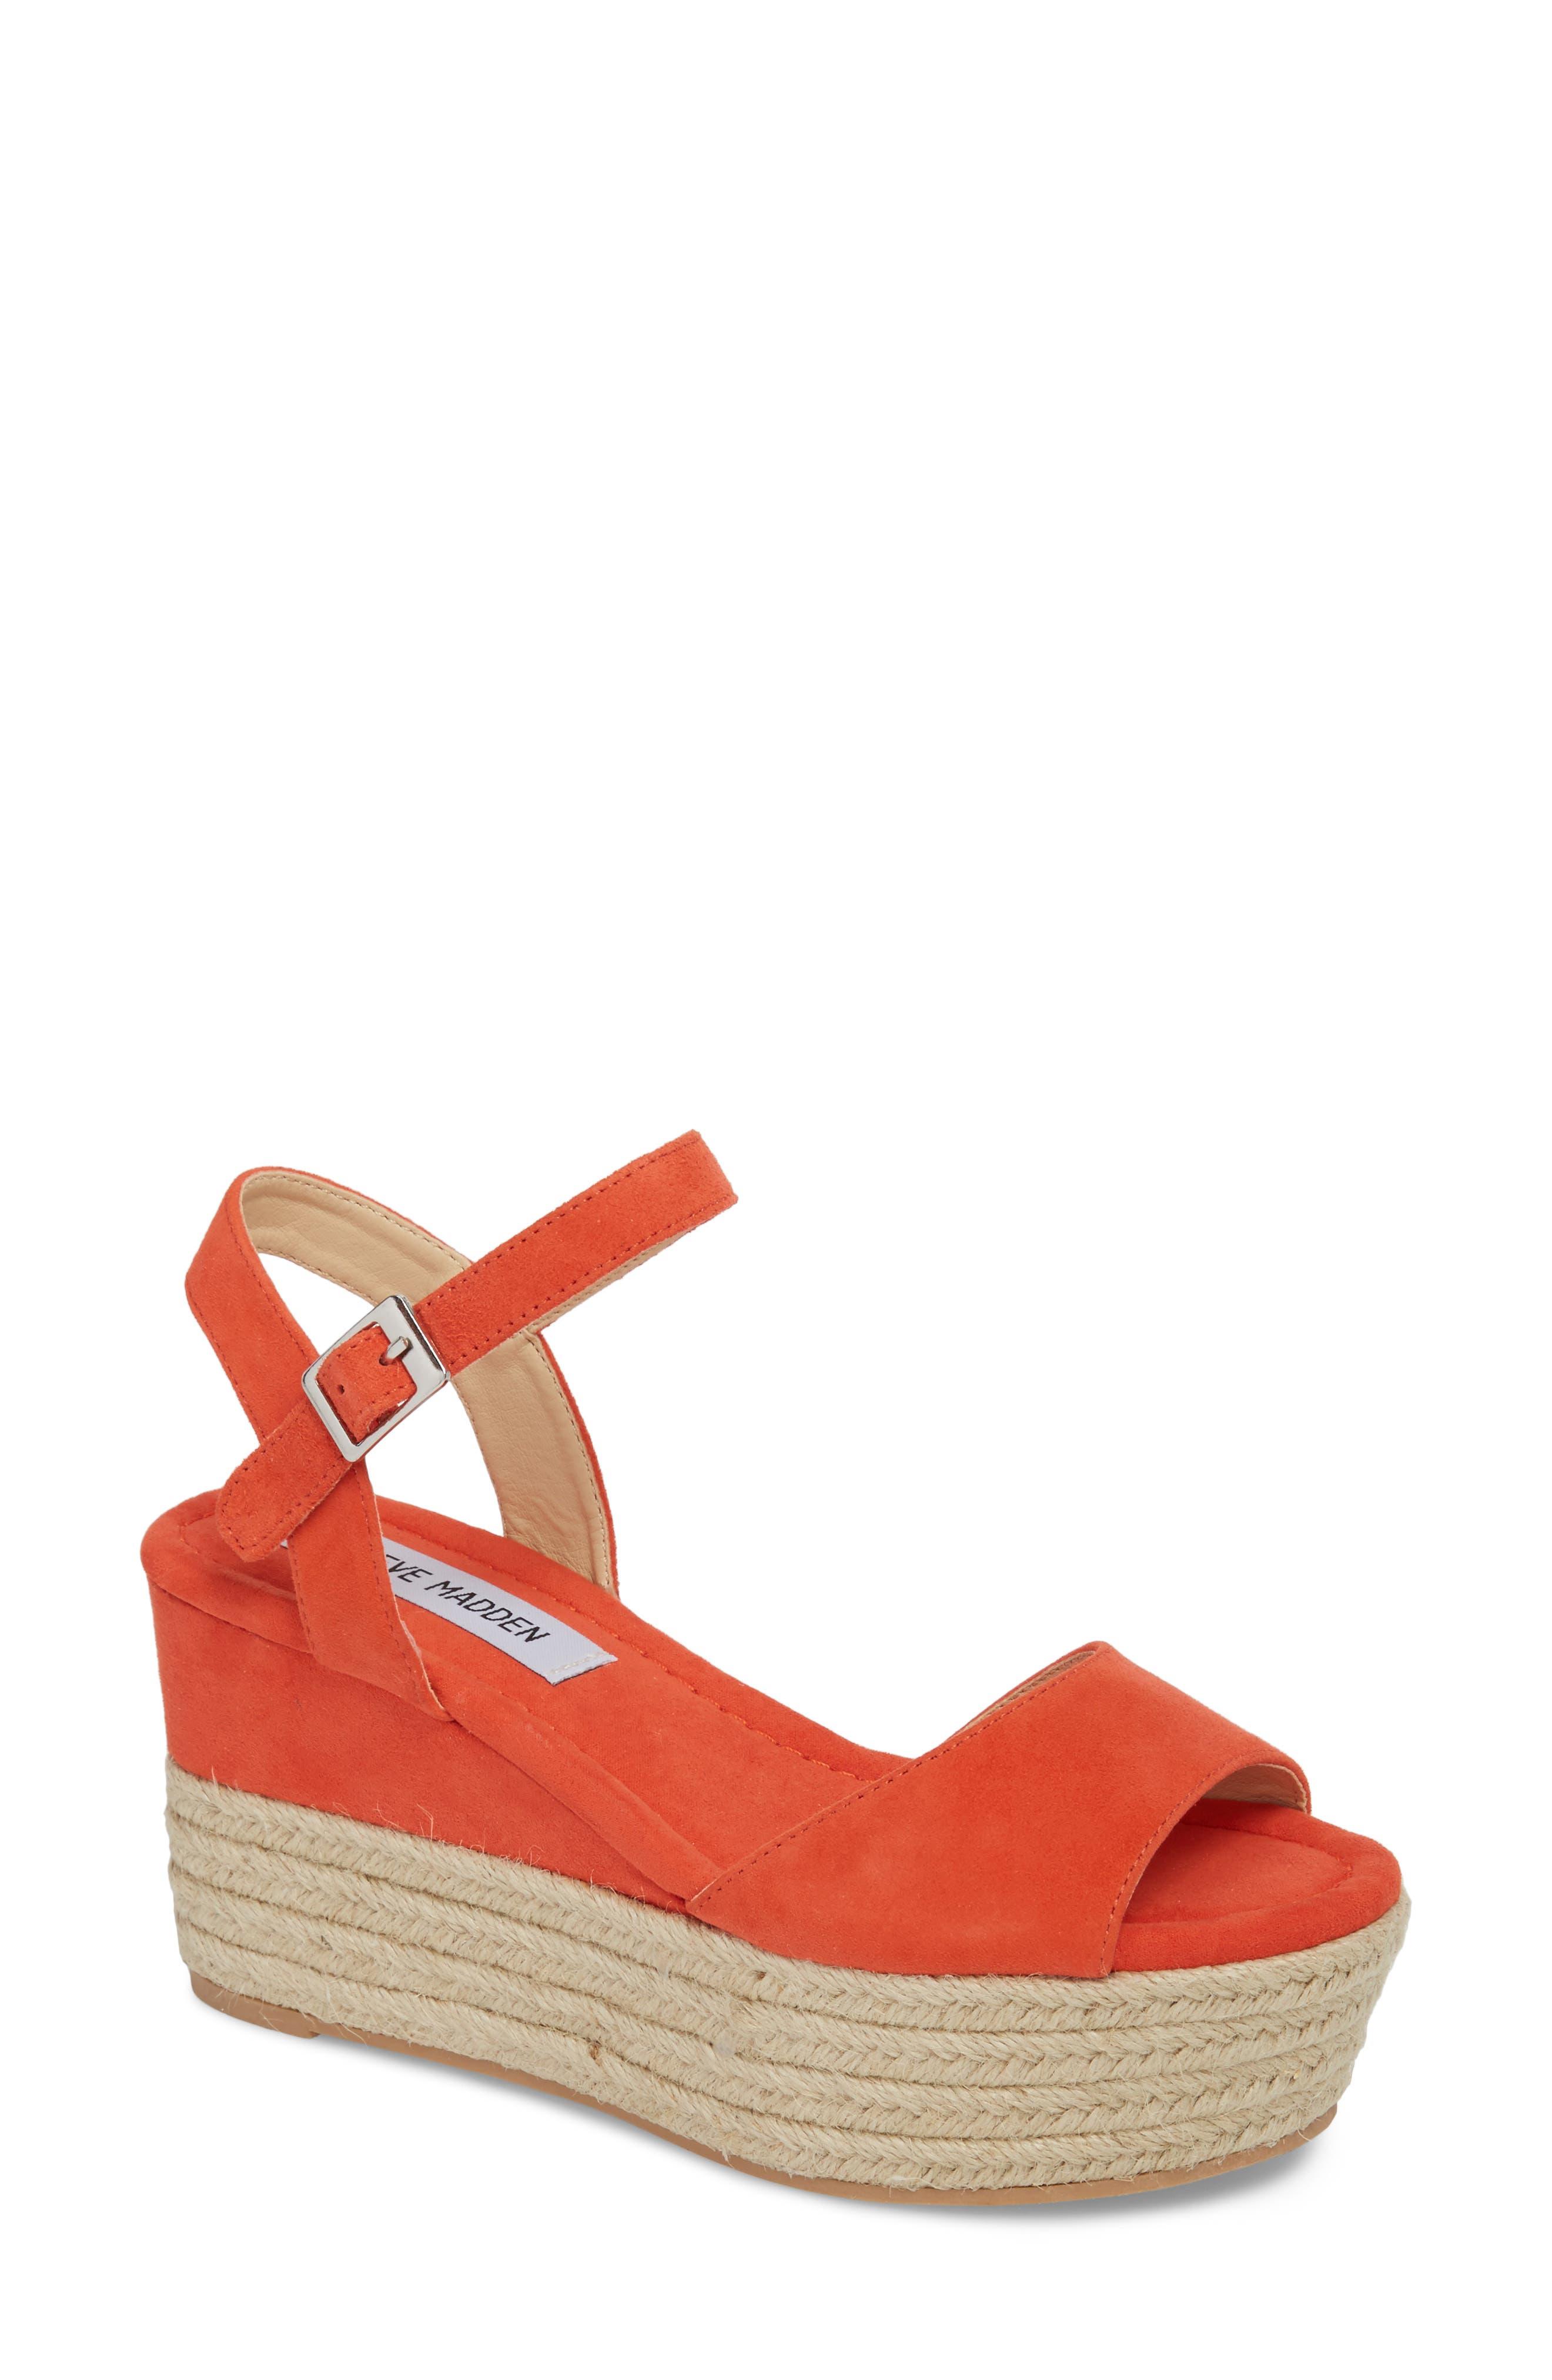 Kianna Espadrille Wedge Sandal,                             Main thumbnail 1, color,                             Coral Suede